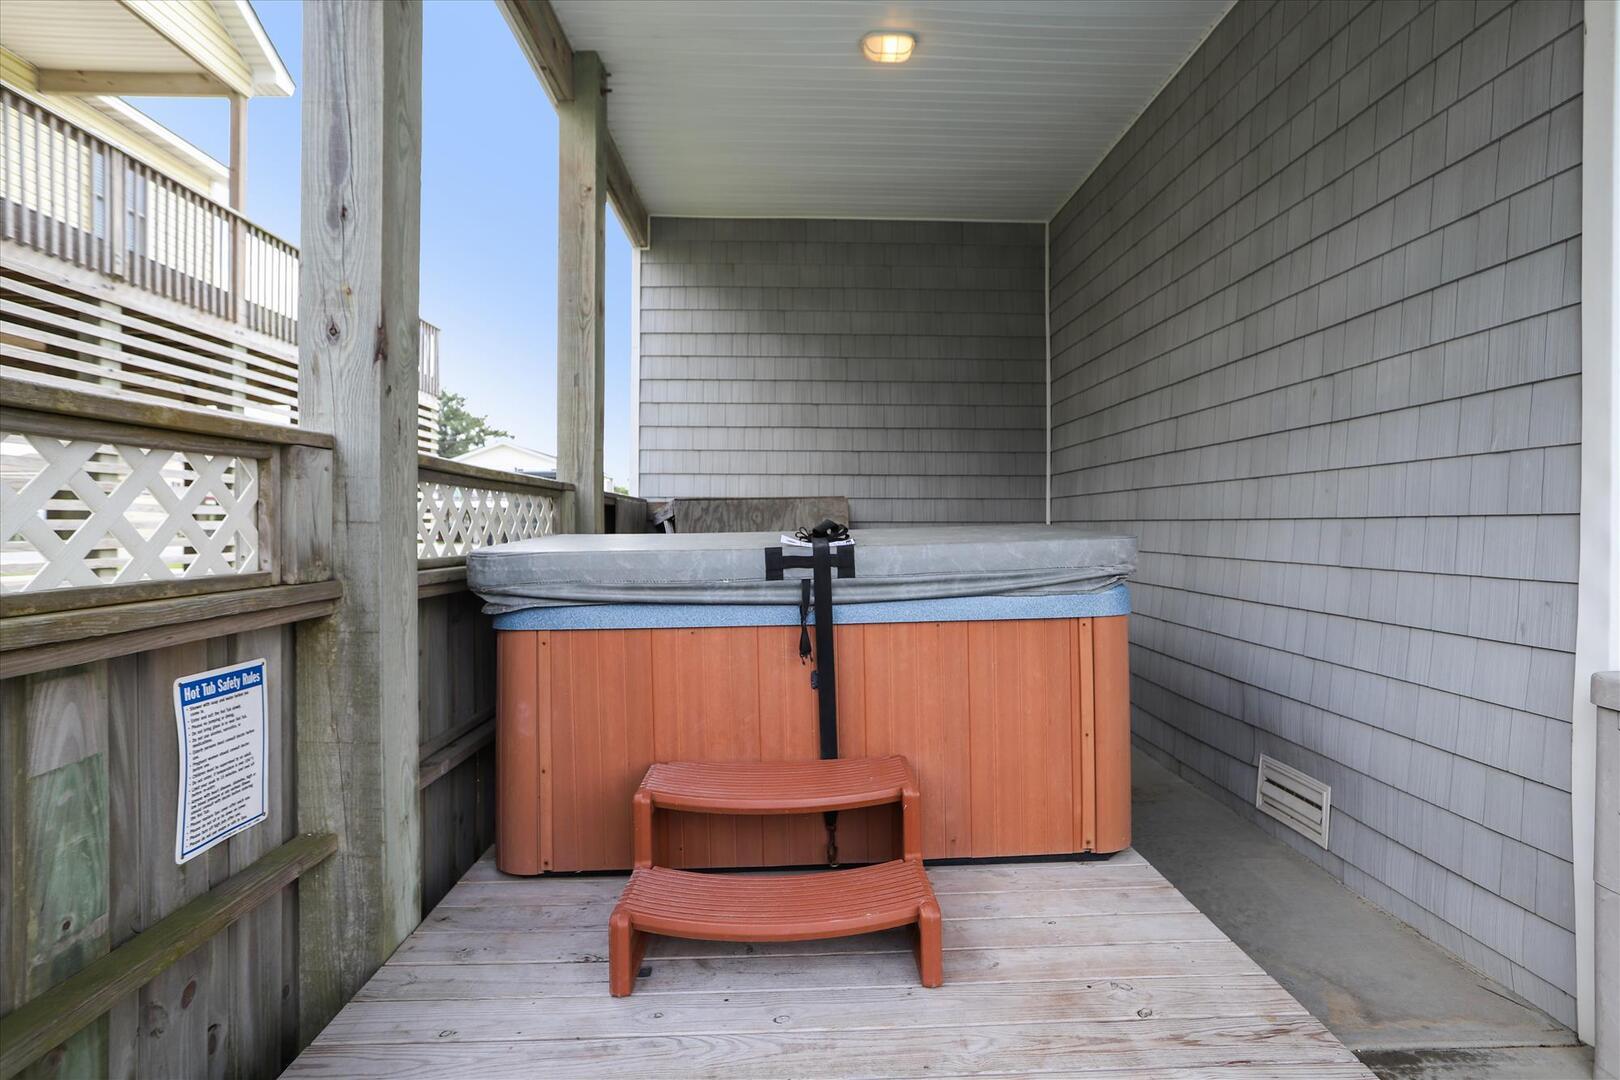 Pool Level,Hot Tub,